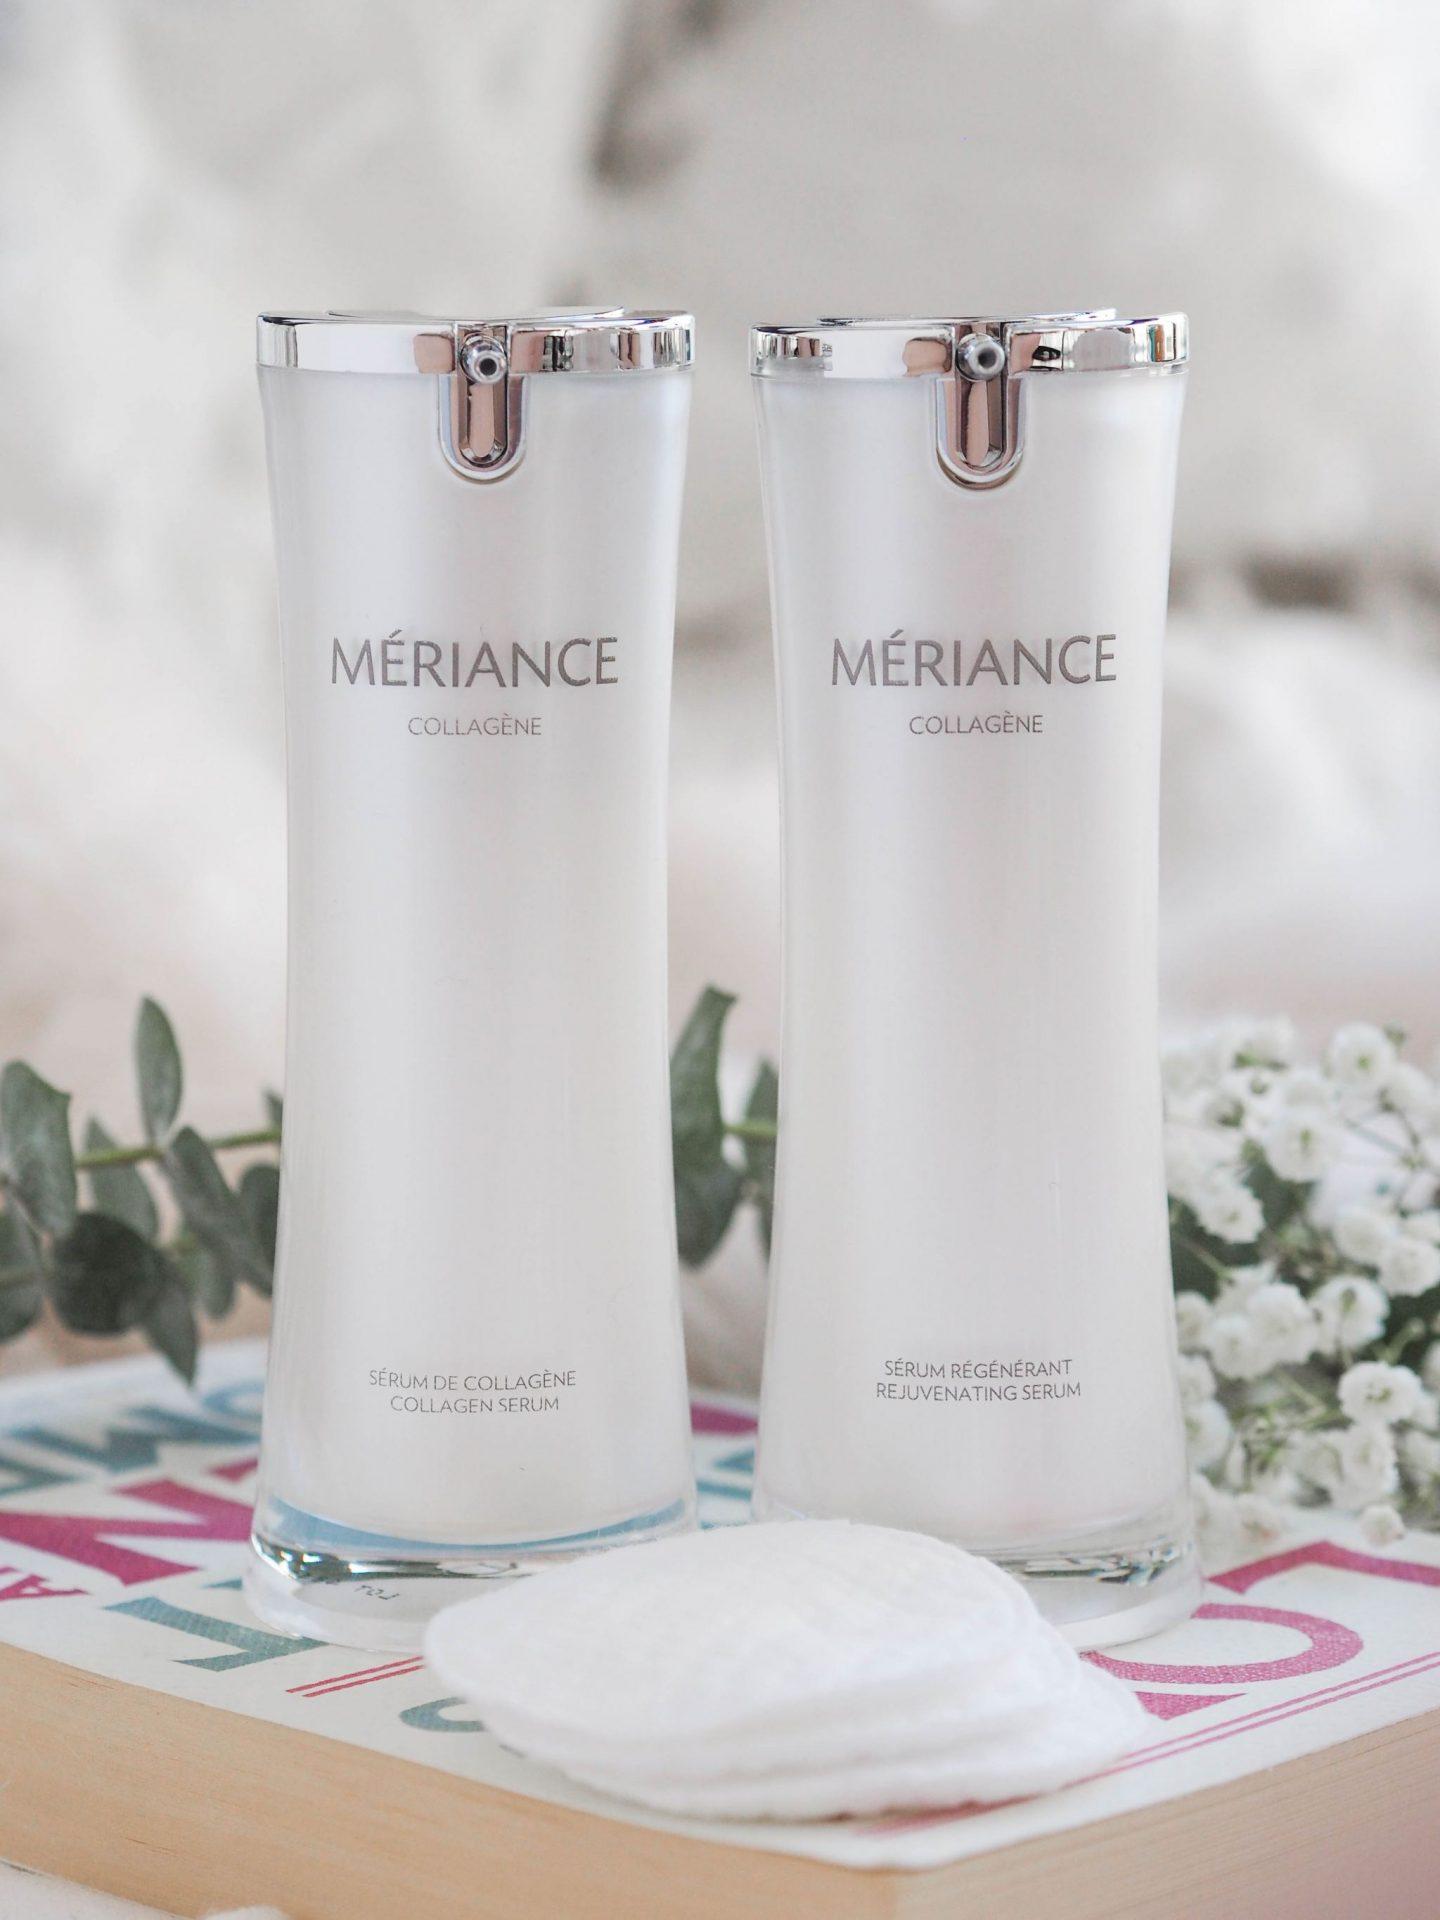 Mériance Collagène skincare